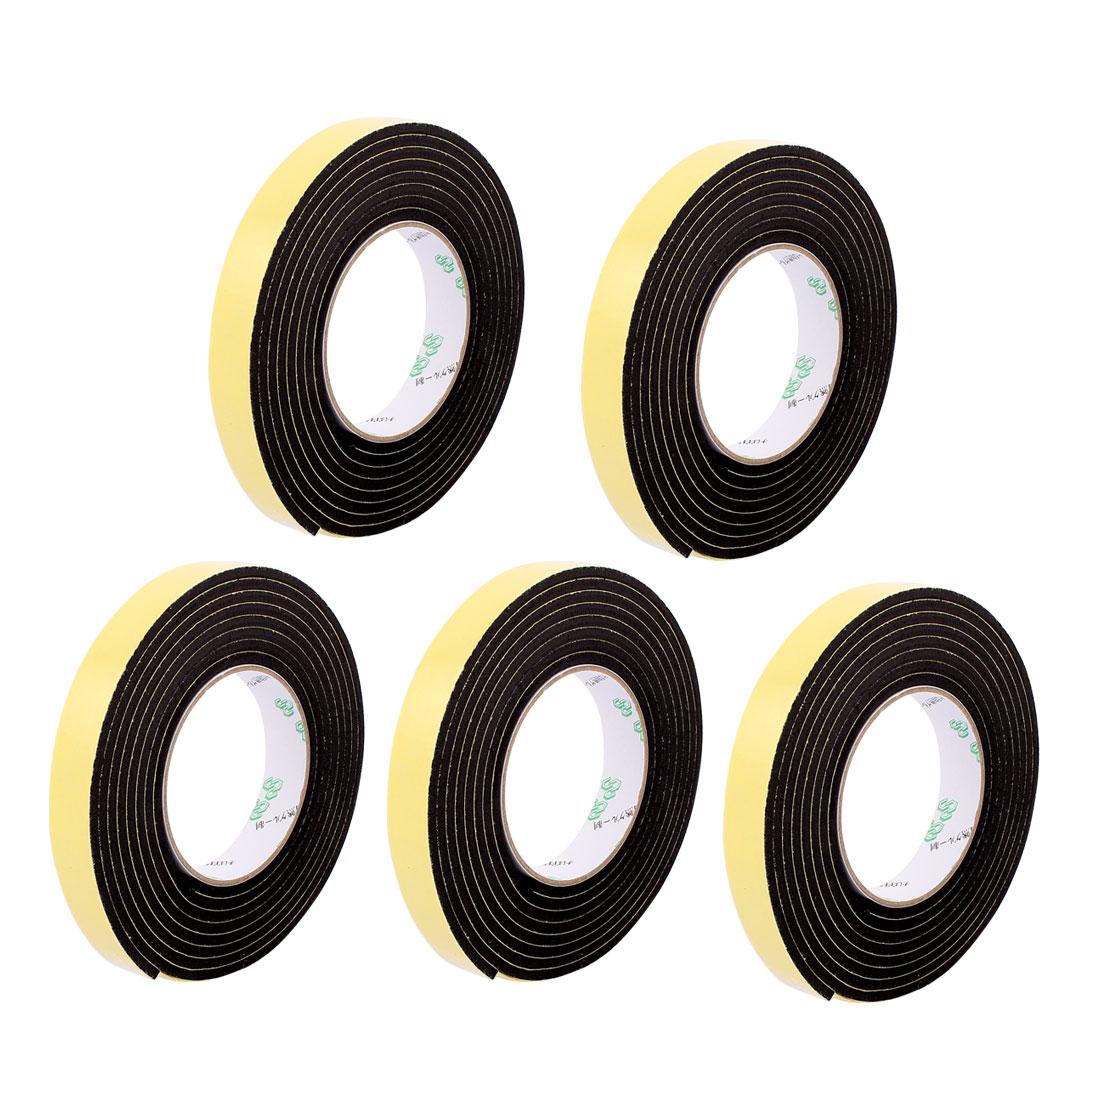 5 Pcs 20mmx4mm Single Sided Sponge Tape Adhesive Sticker Foam Glue Strip Sealing 3 Meters 10Ft